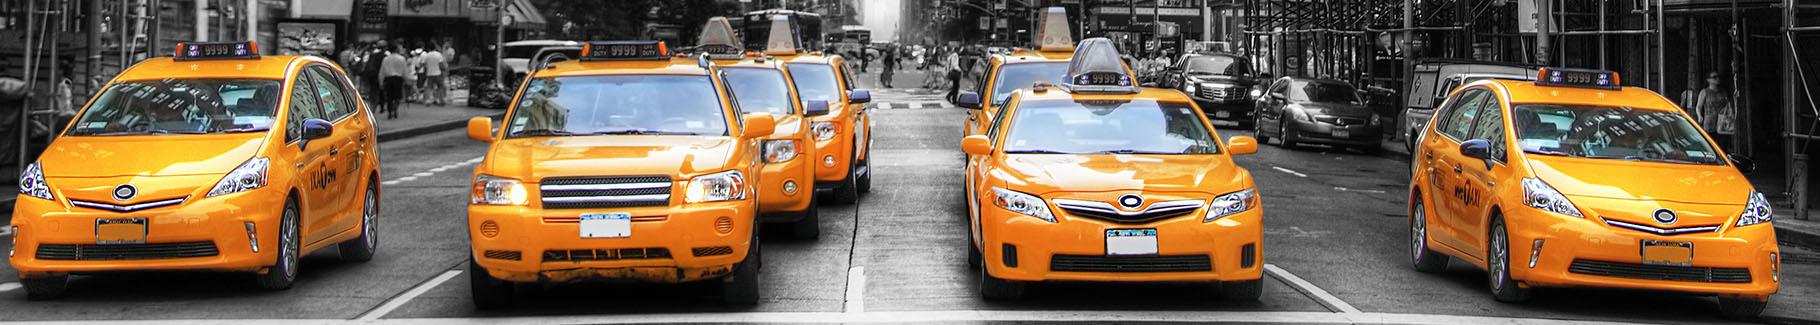 Fototapeta żółta taksówka